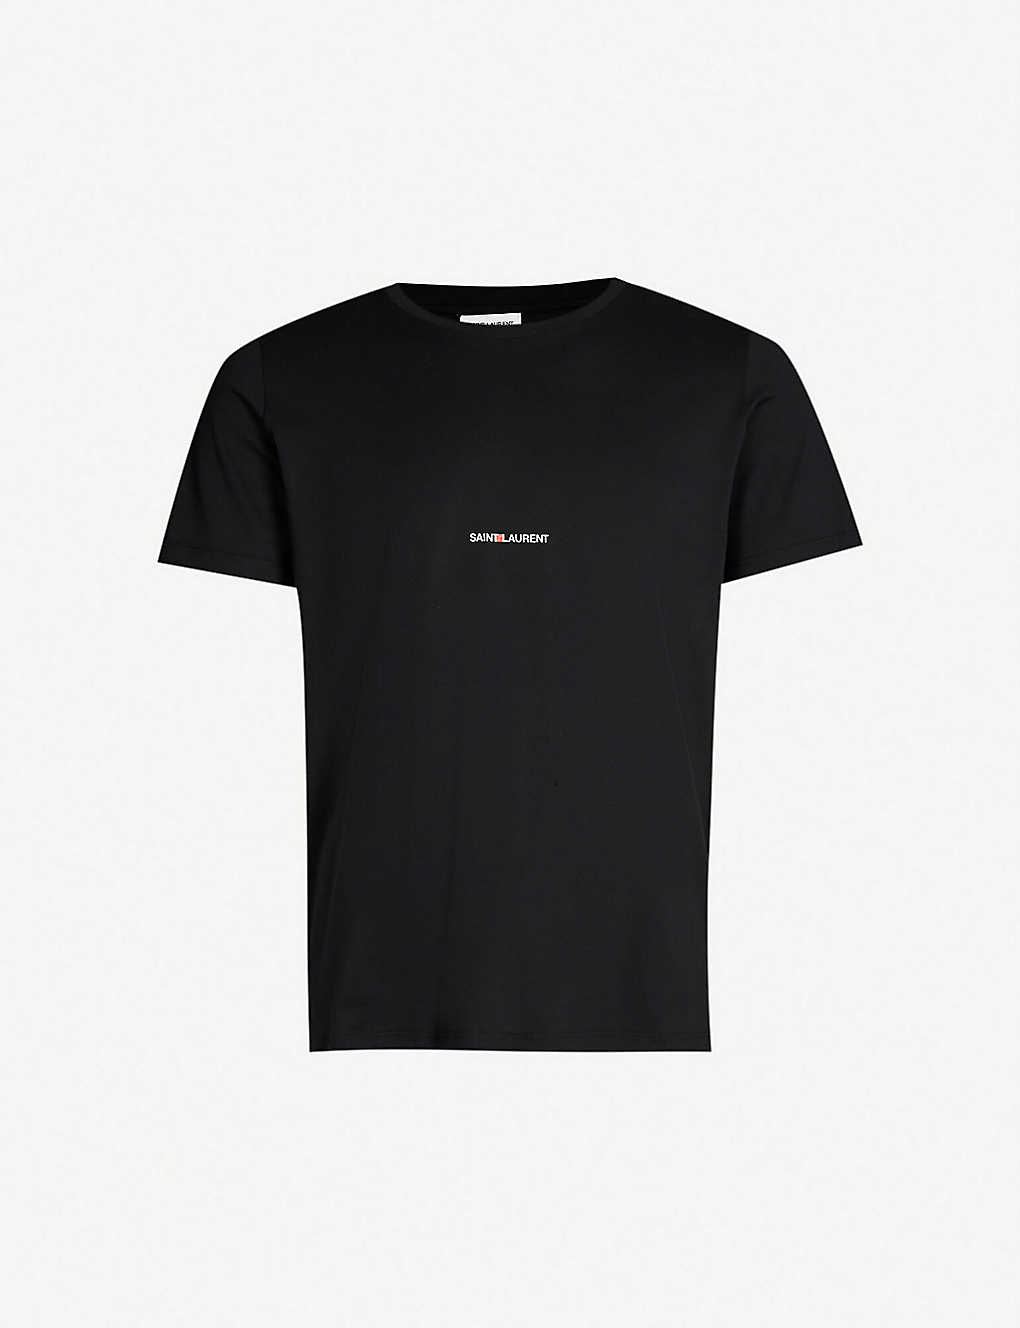 a171133240b SAINT LAURENT - Logo-print cotton-jersey T-shirt | Selfridges.com